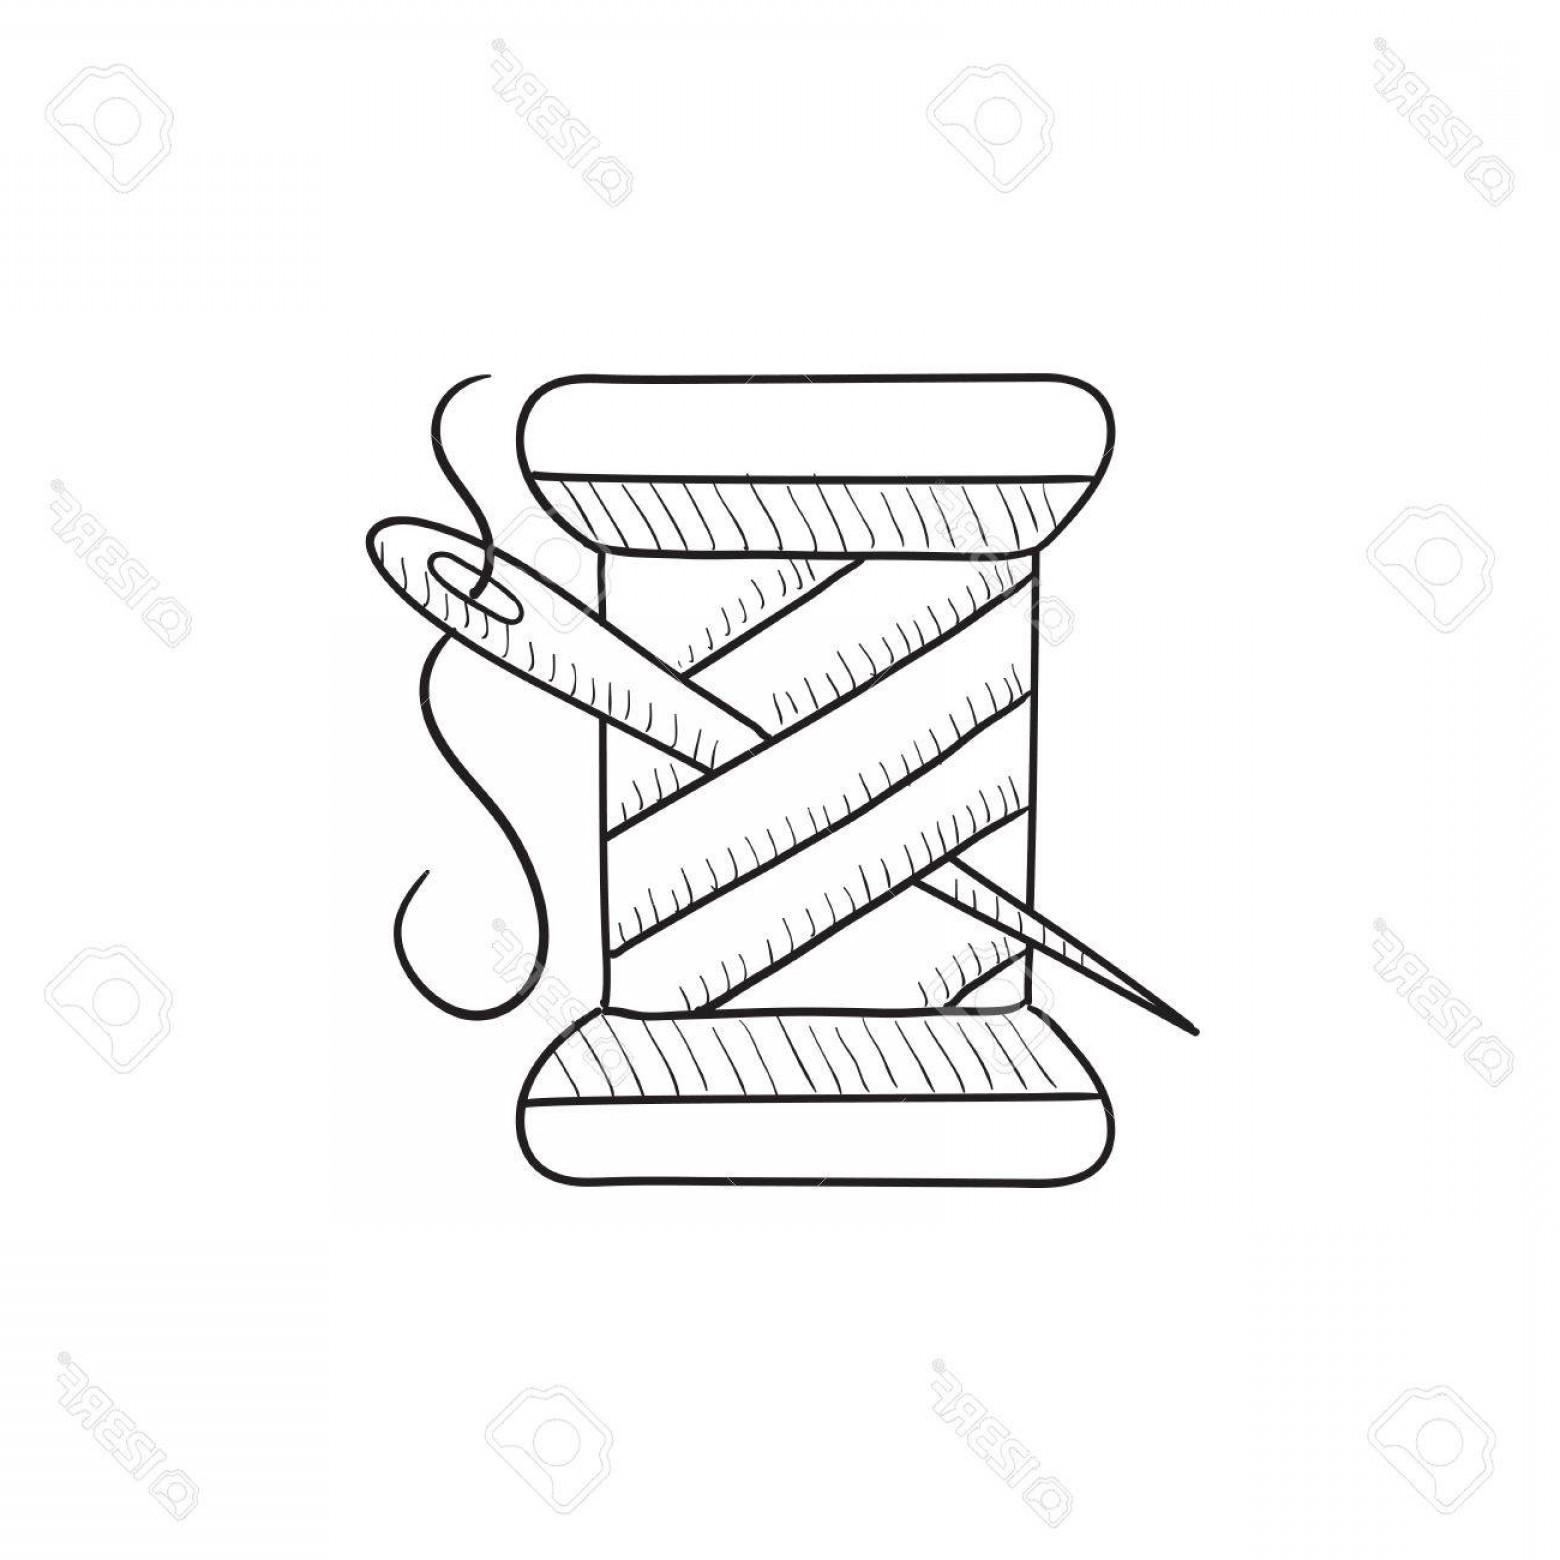 1560x1560 Photostock Vector Spool Of Thread And Needle Vector Sketch Icon